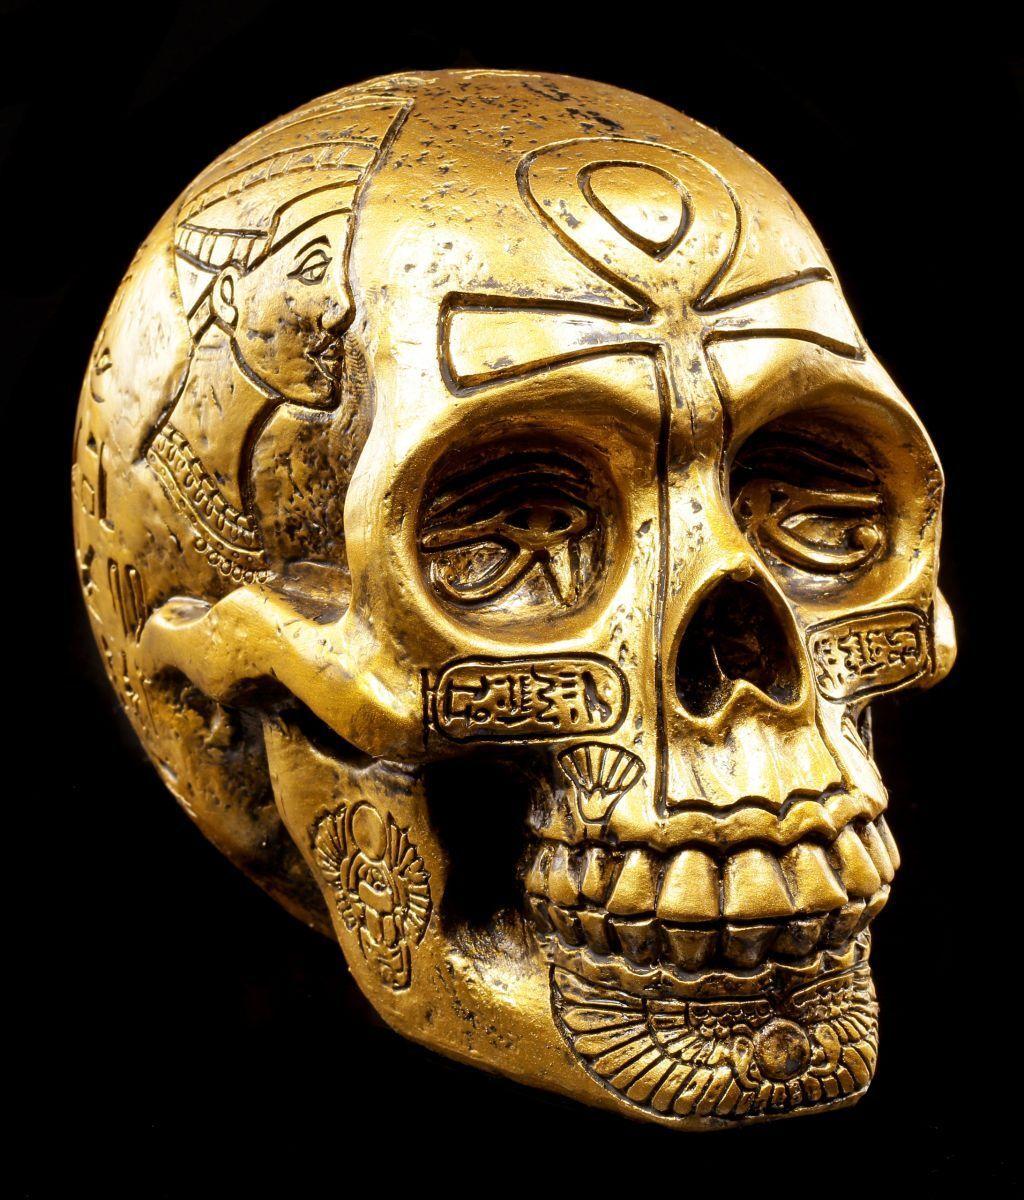 Égyptien Mort or - Figurine Déco Crâne Skull